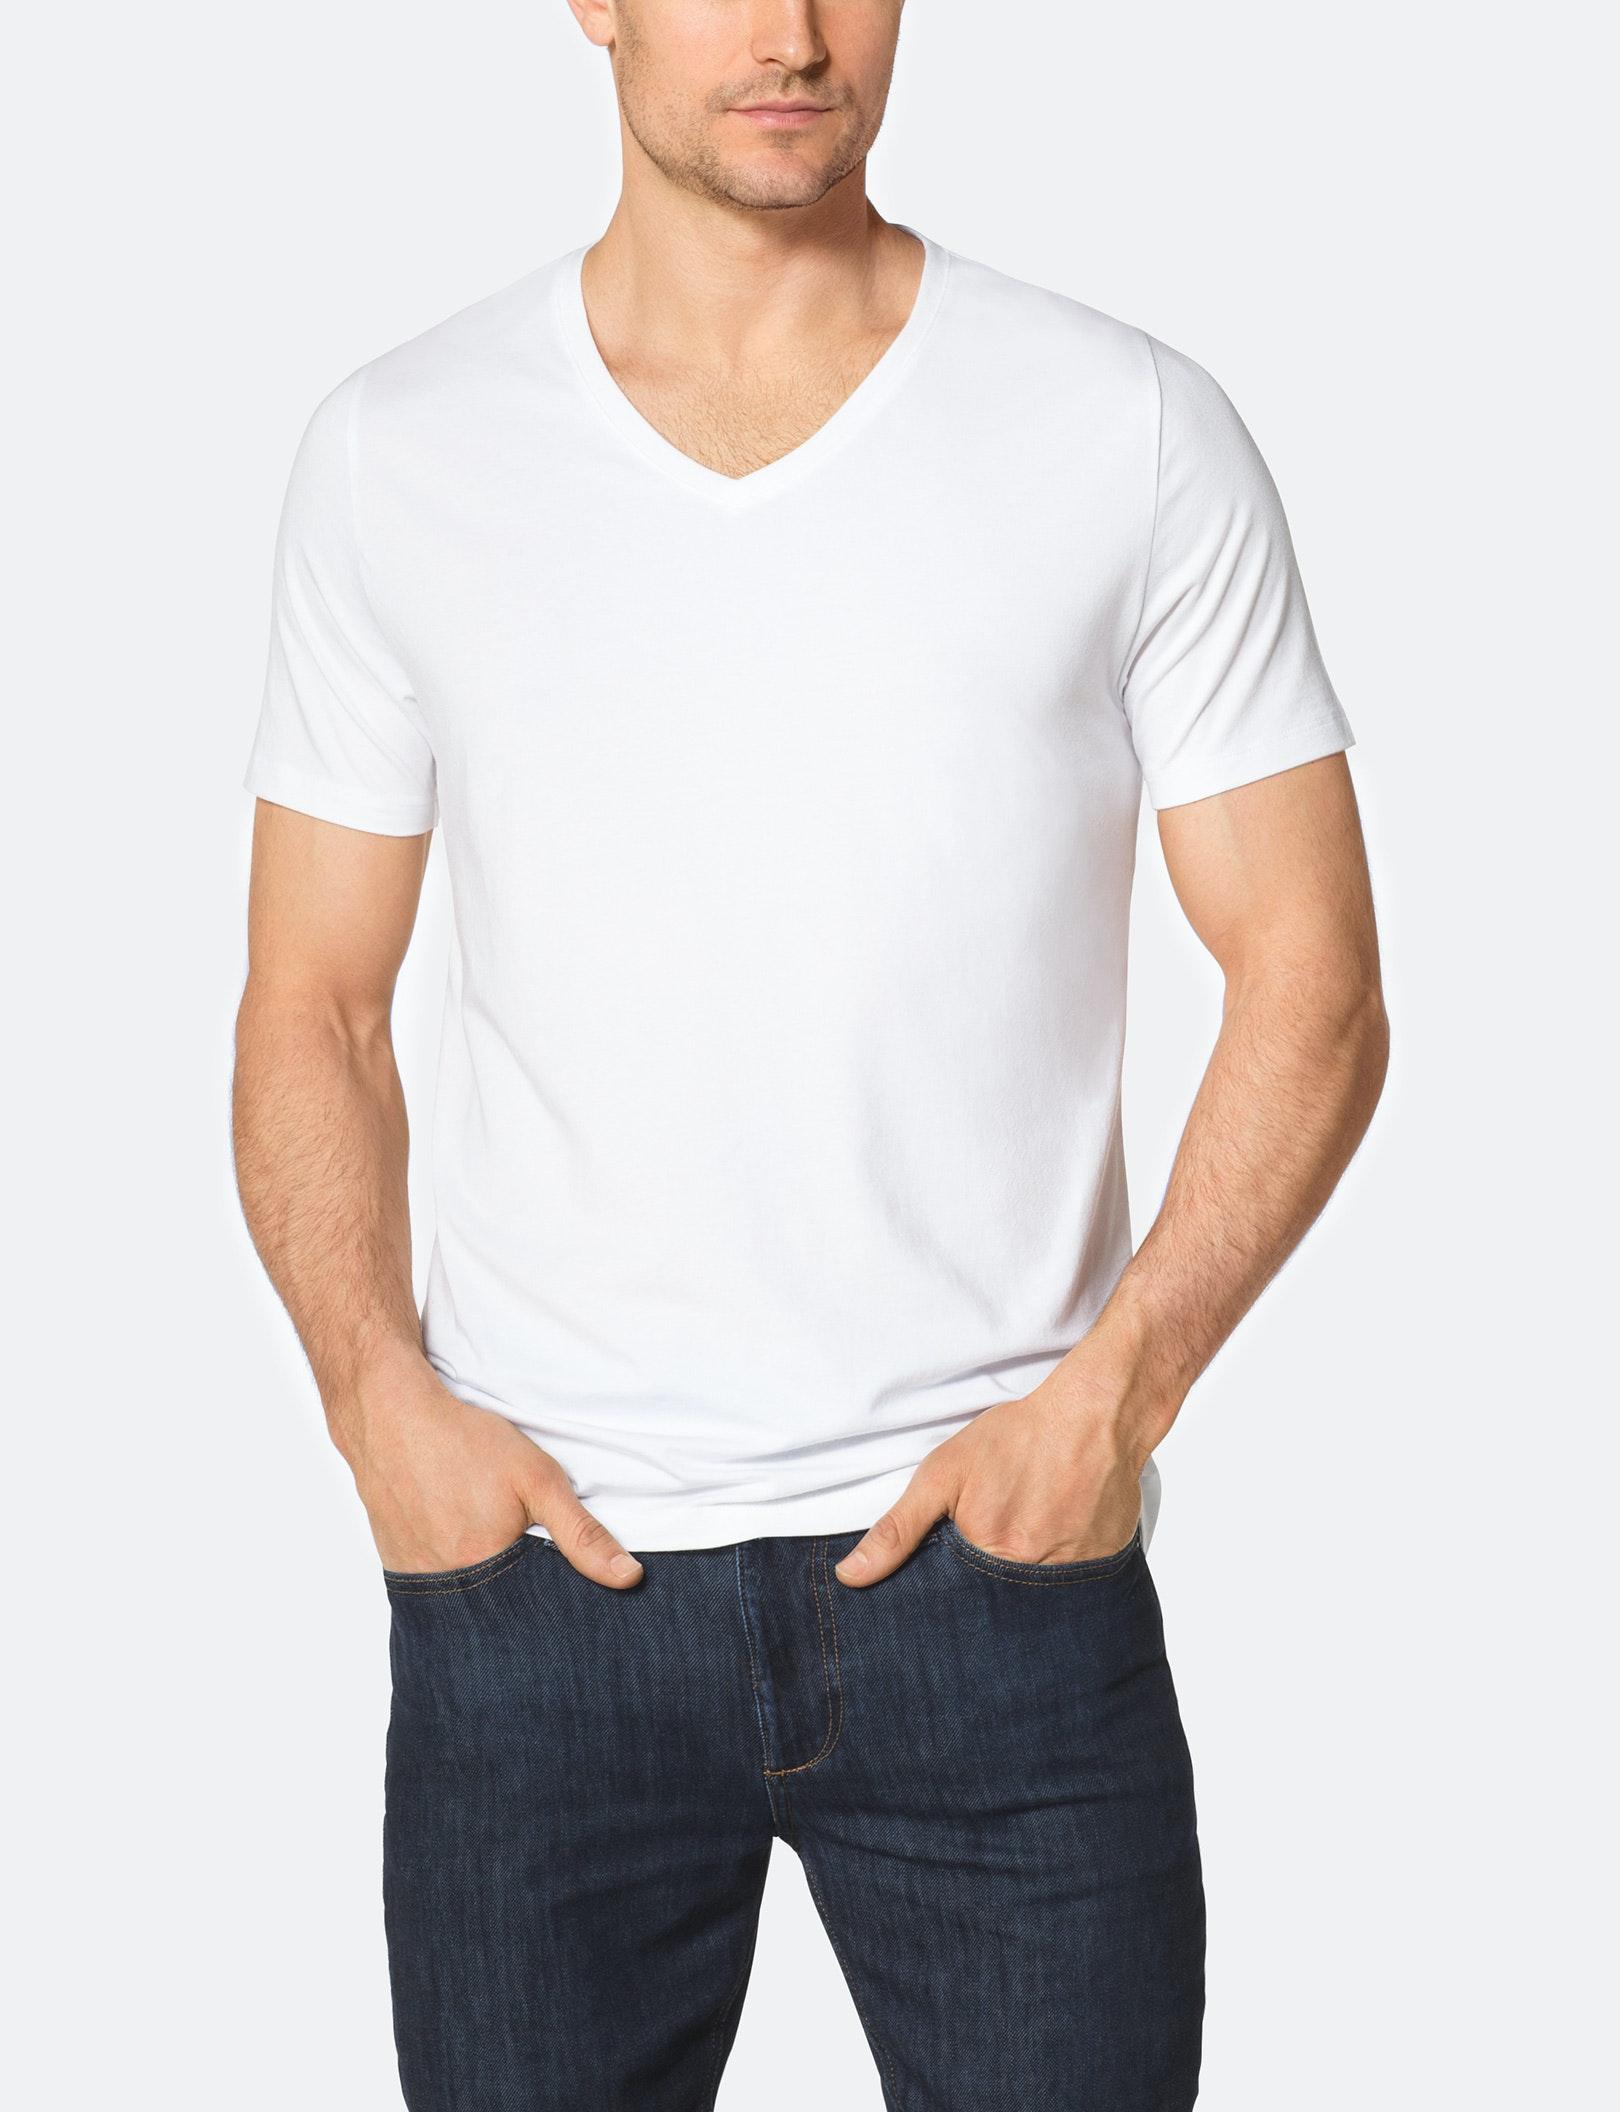 Mens Deep V Neck T Shirts